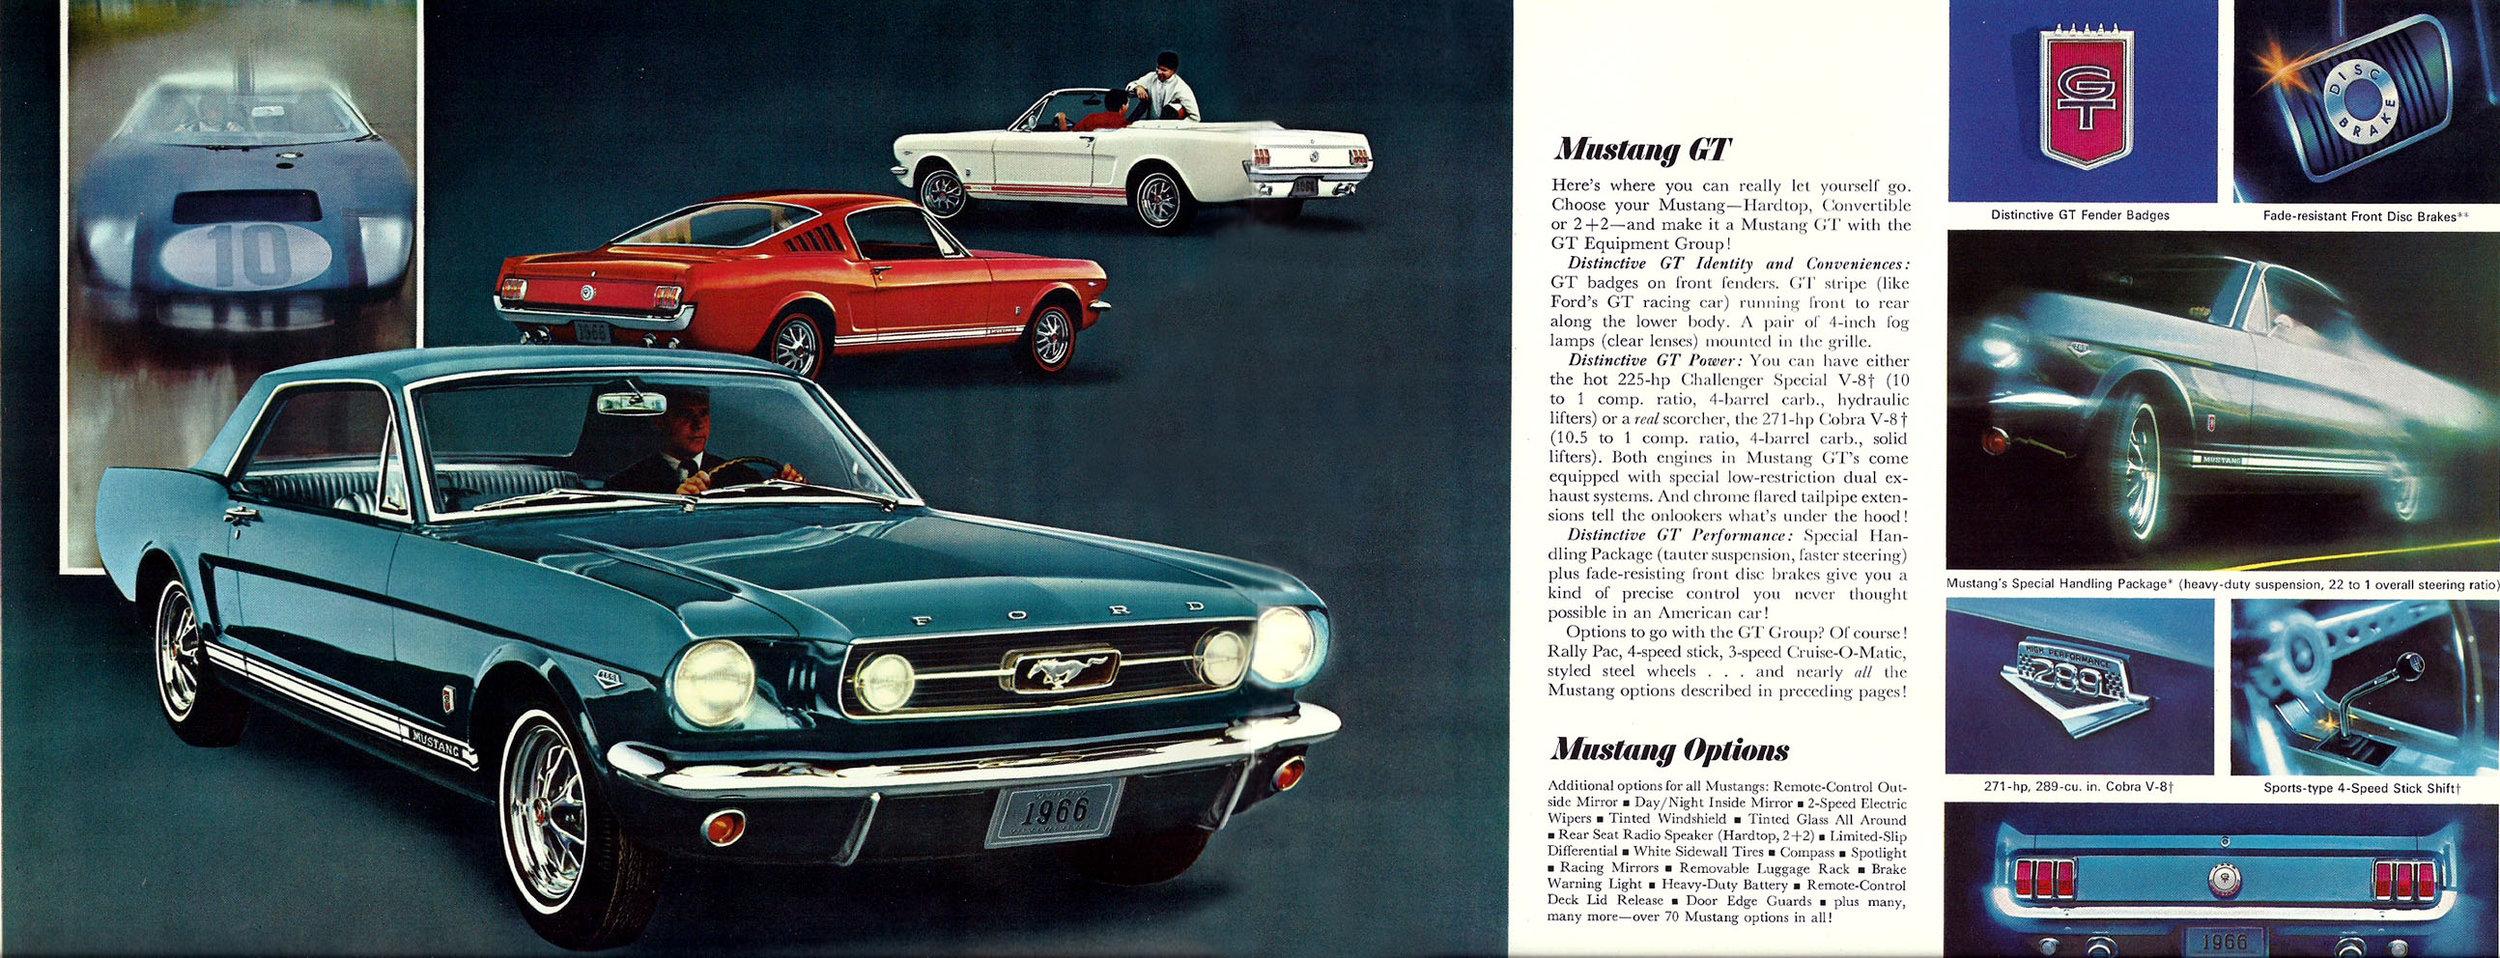 1966 Mustang GT - hardtop, fastback or soft top